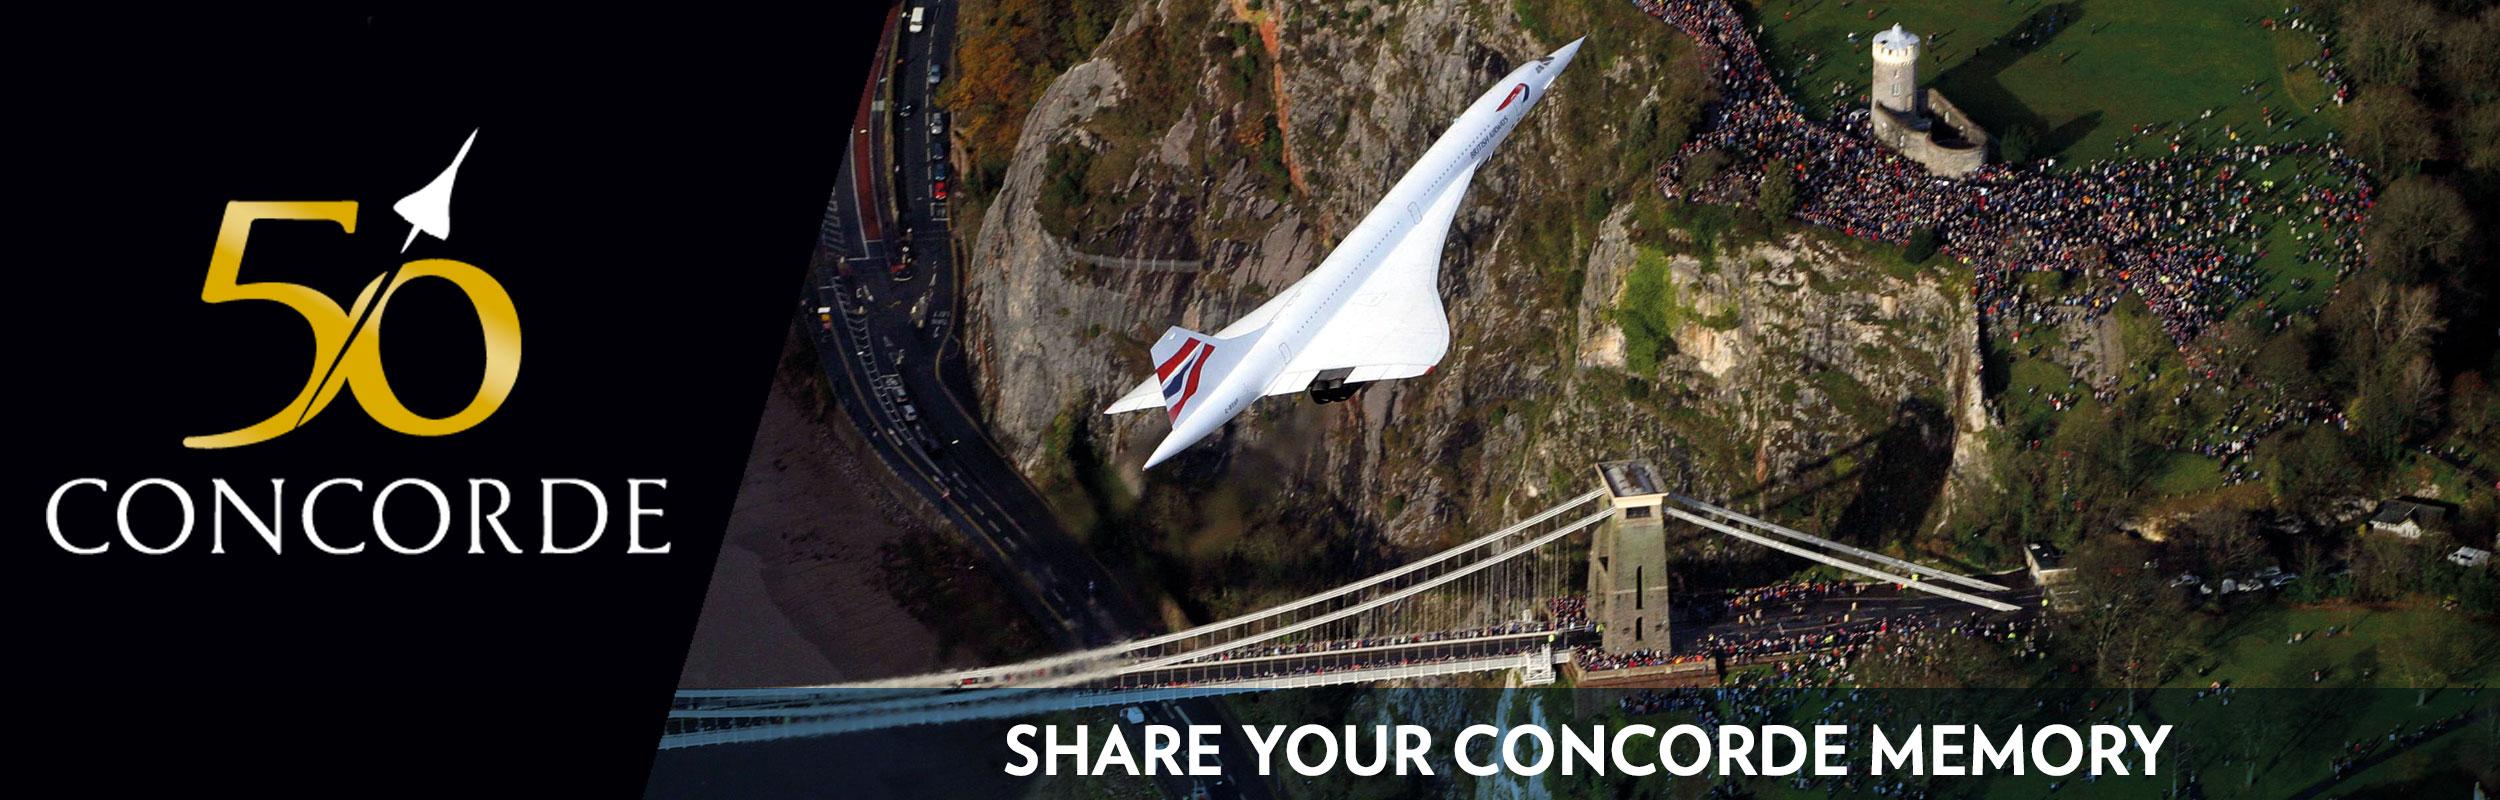 C50-Concorde-memory.jpg